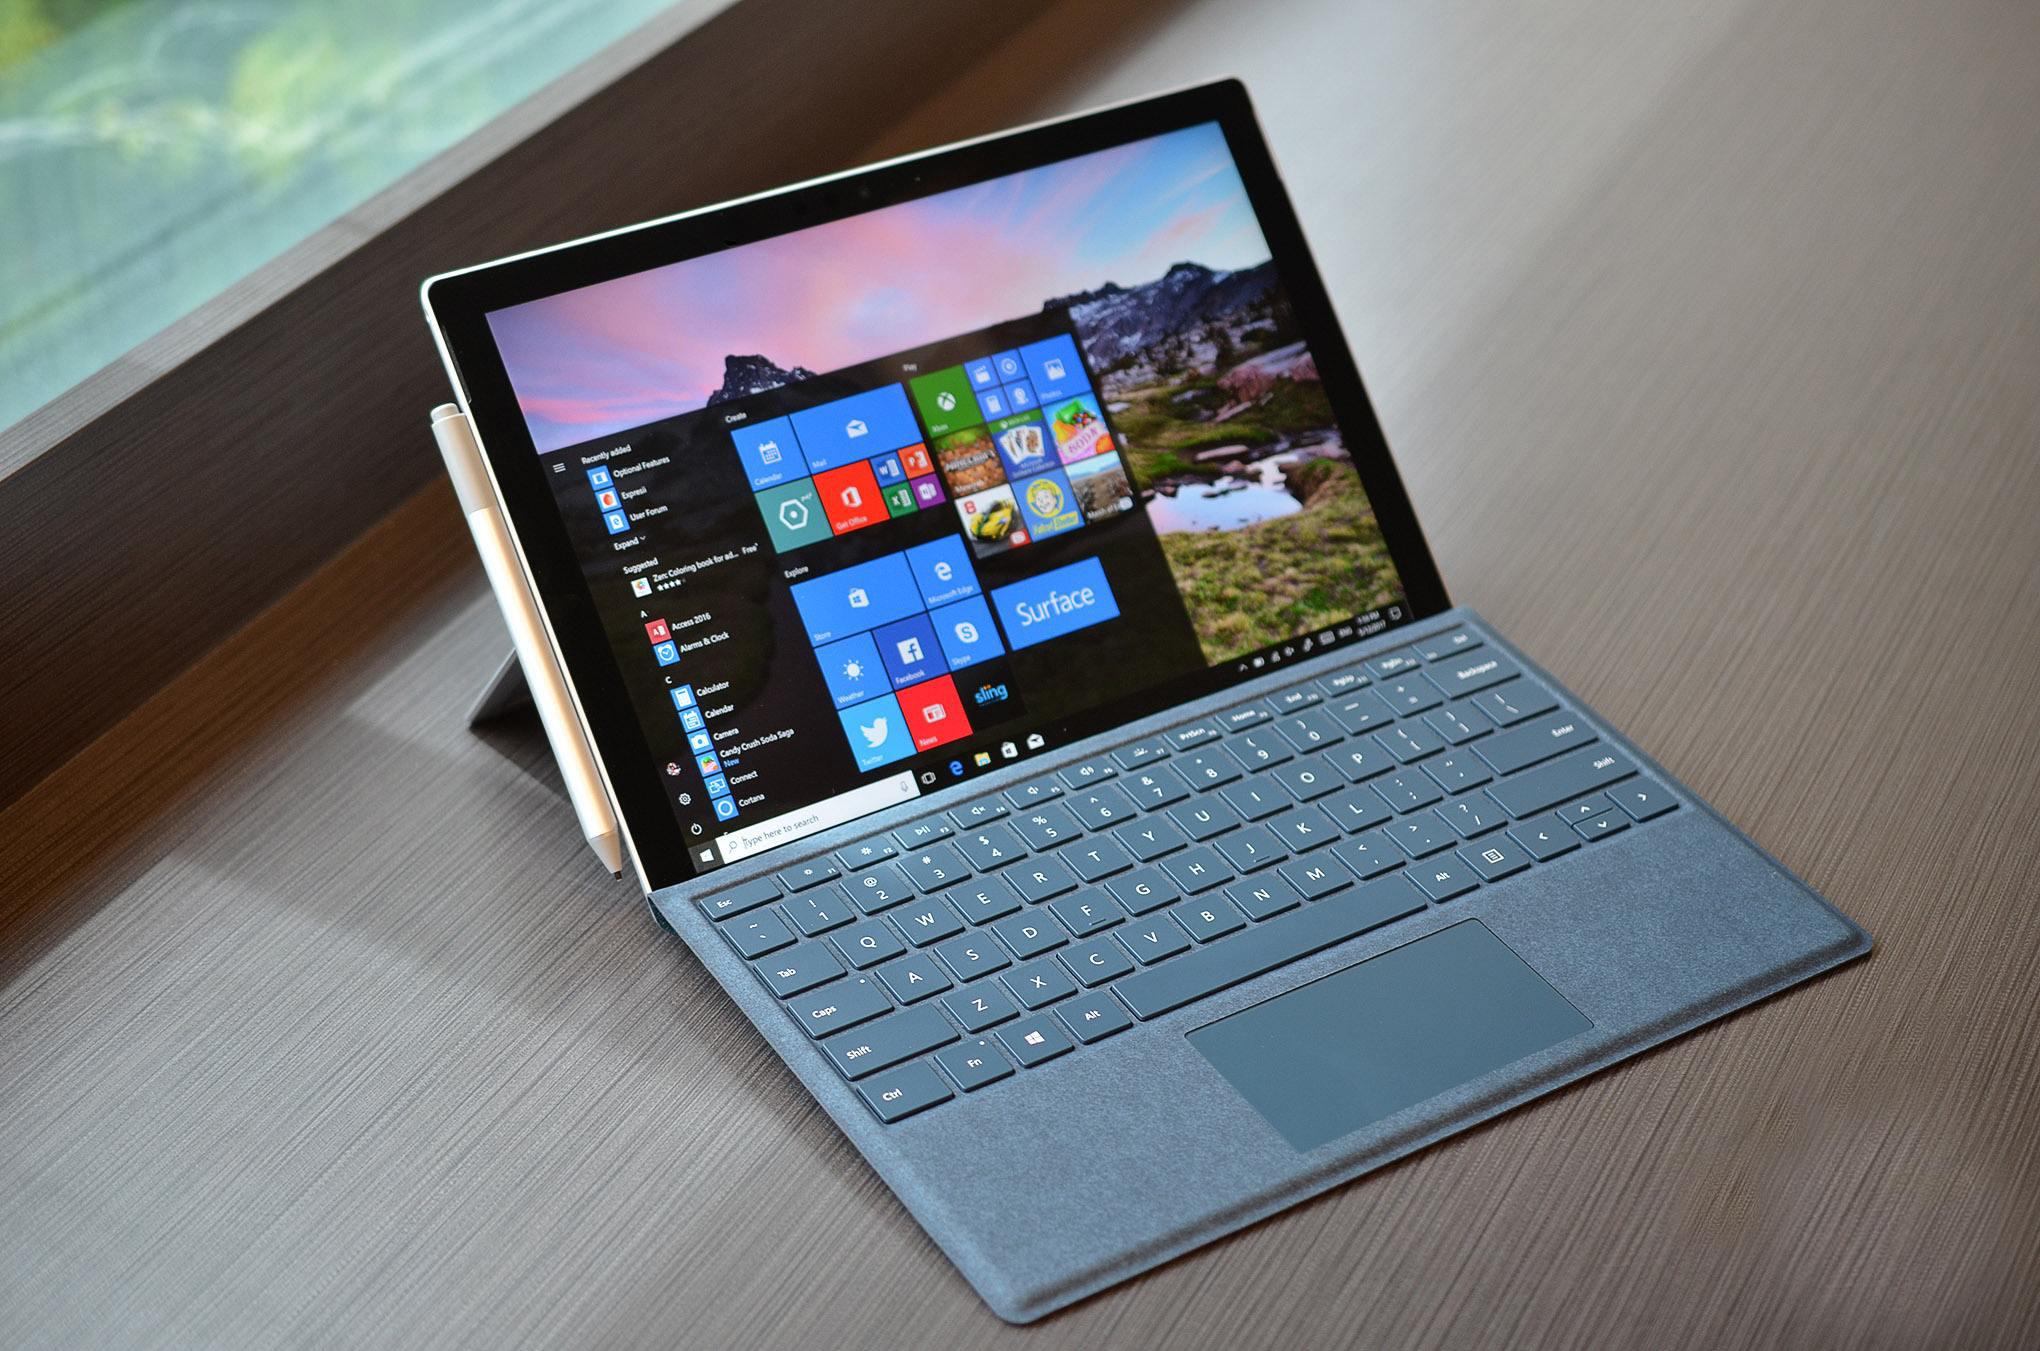 Go 轻薄便捷 win10 笔记本二合一平板电脑 6 5 Pro4 Surface 微软